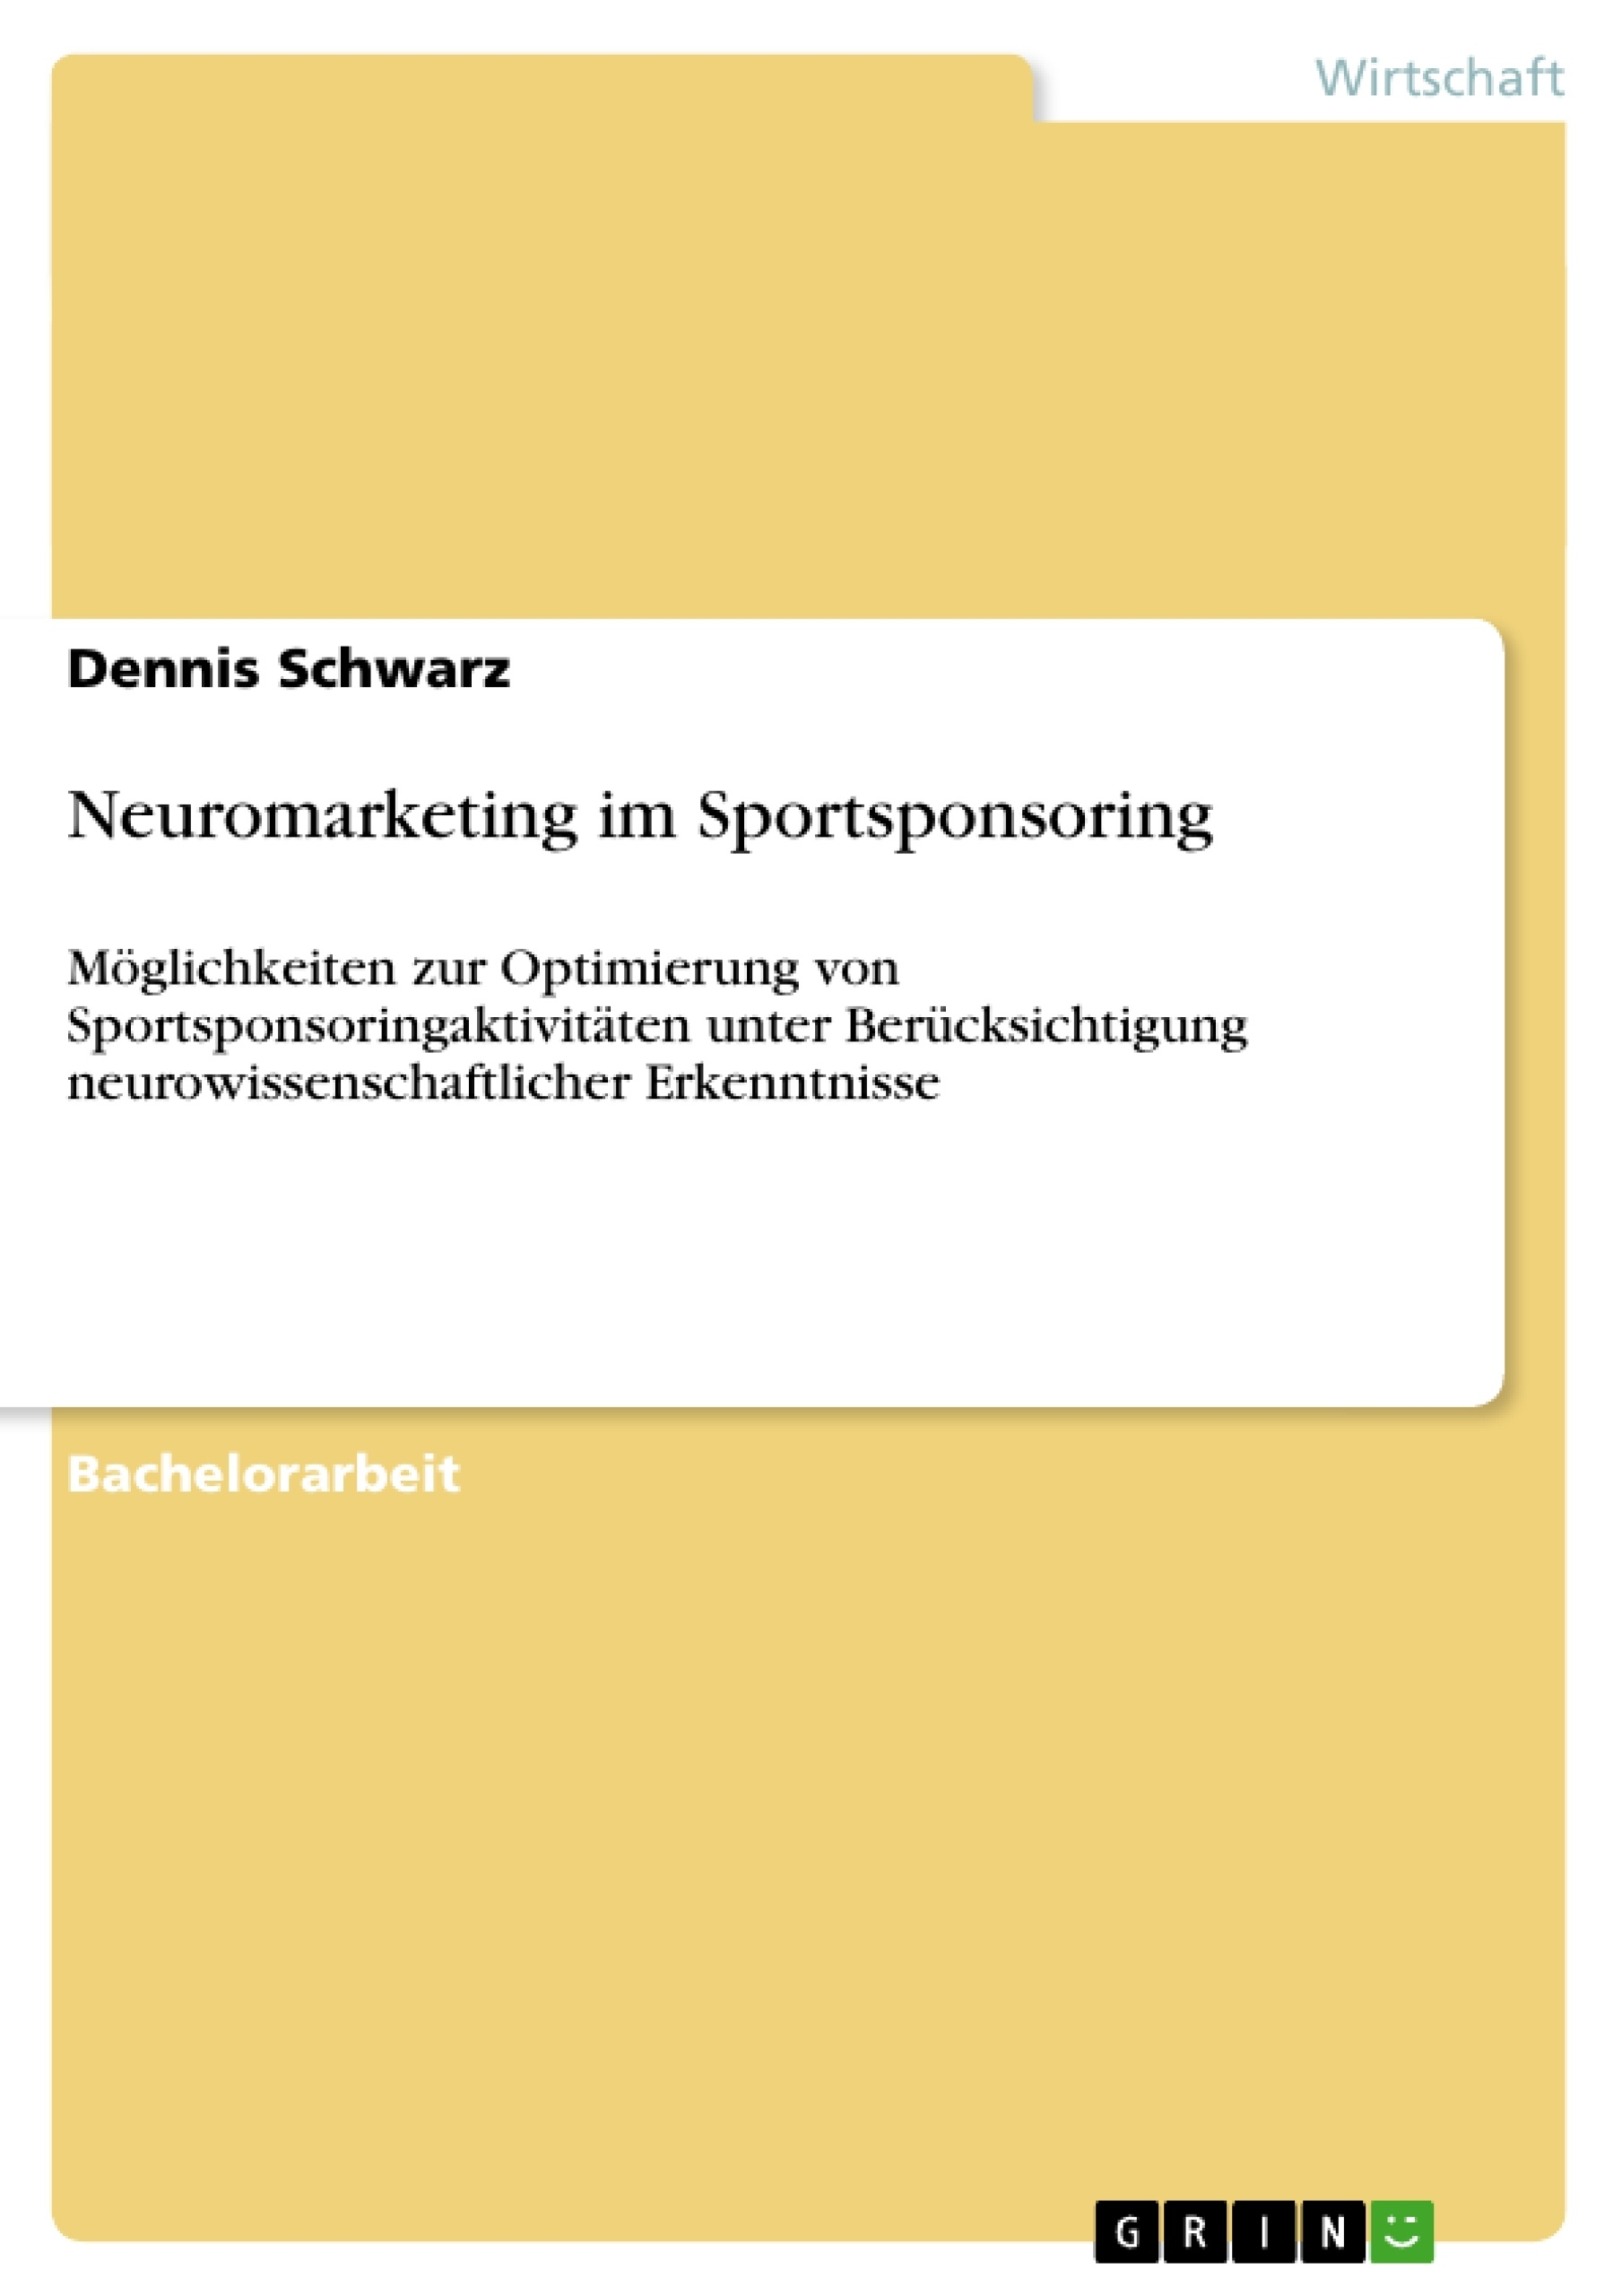 Titel: Neuromarketing im Sportsponsoring